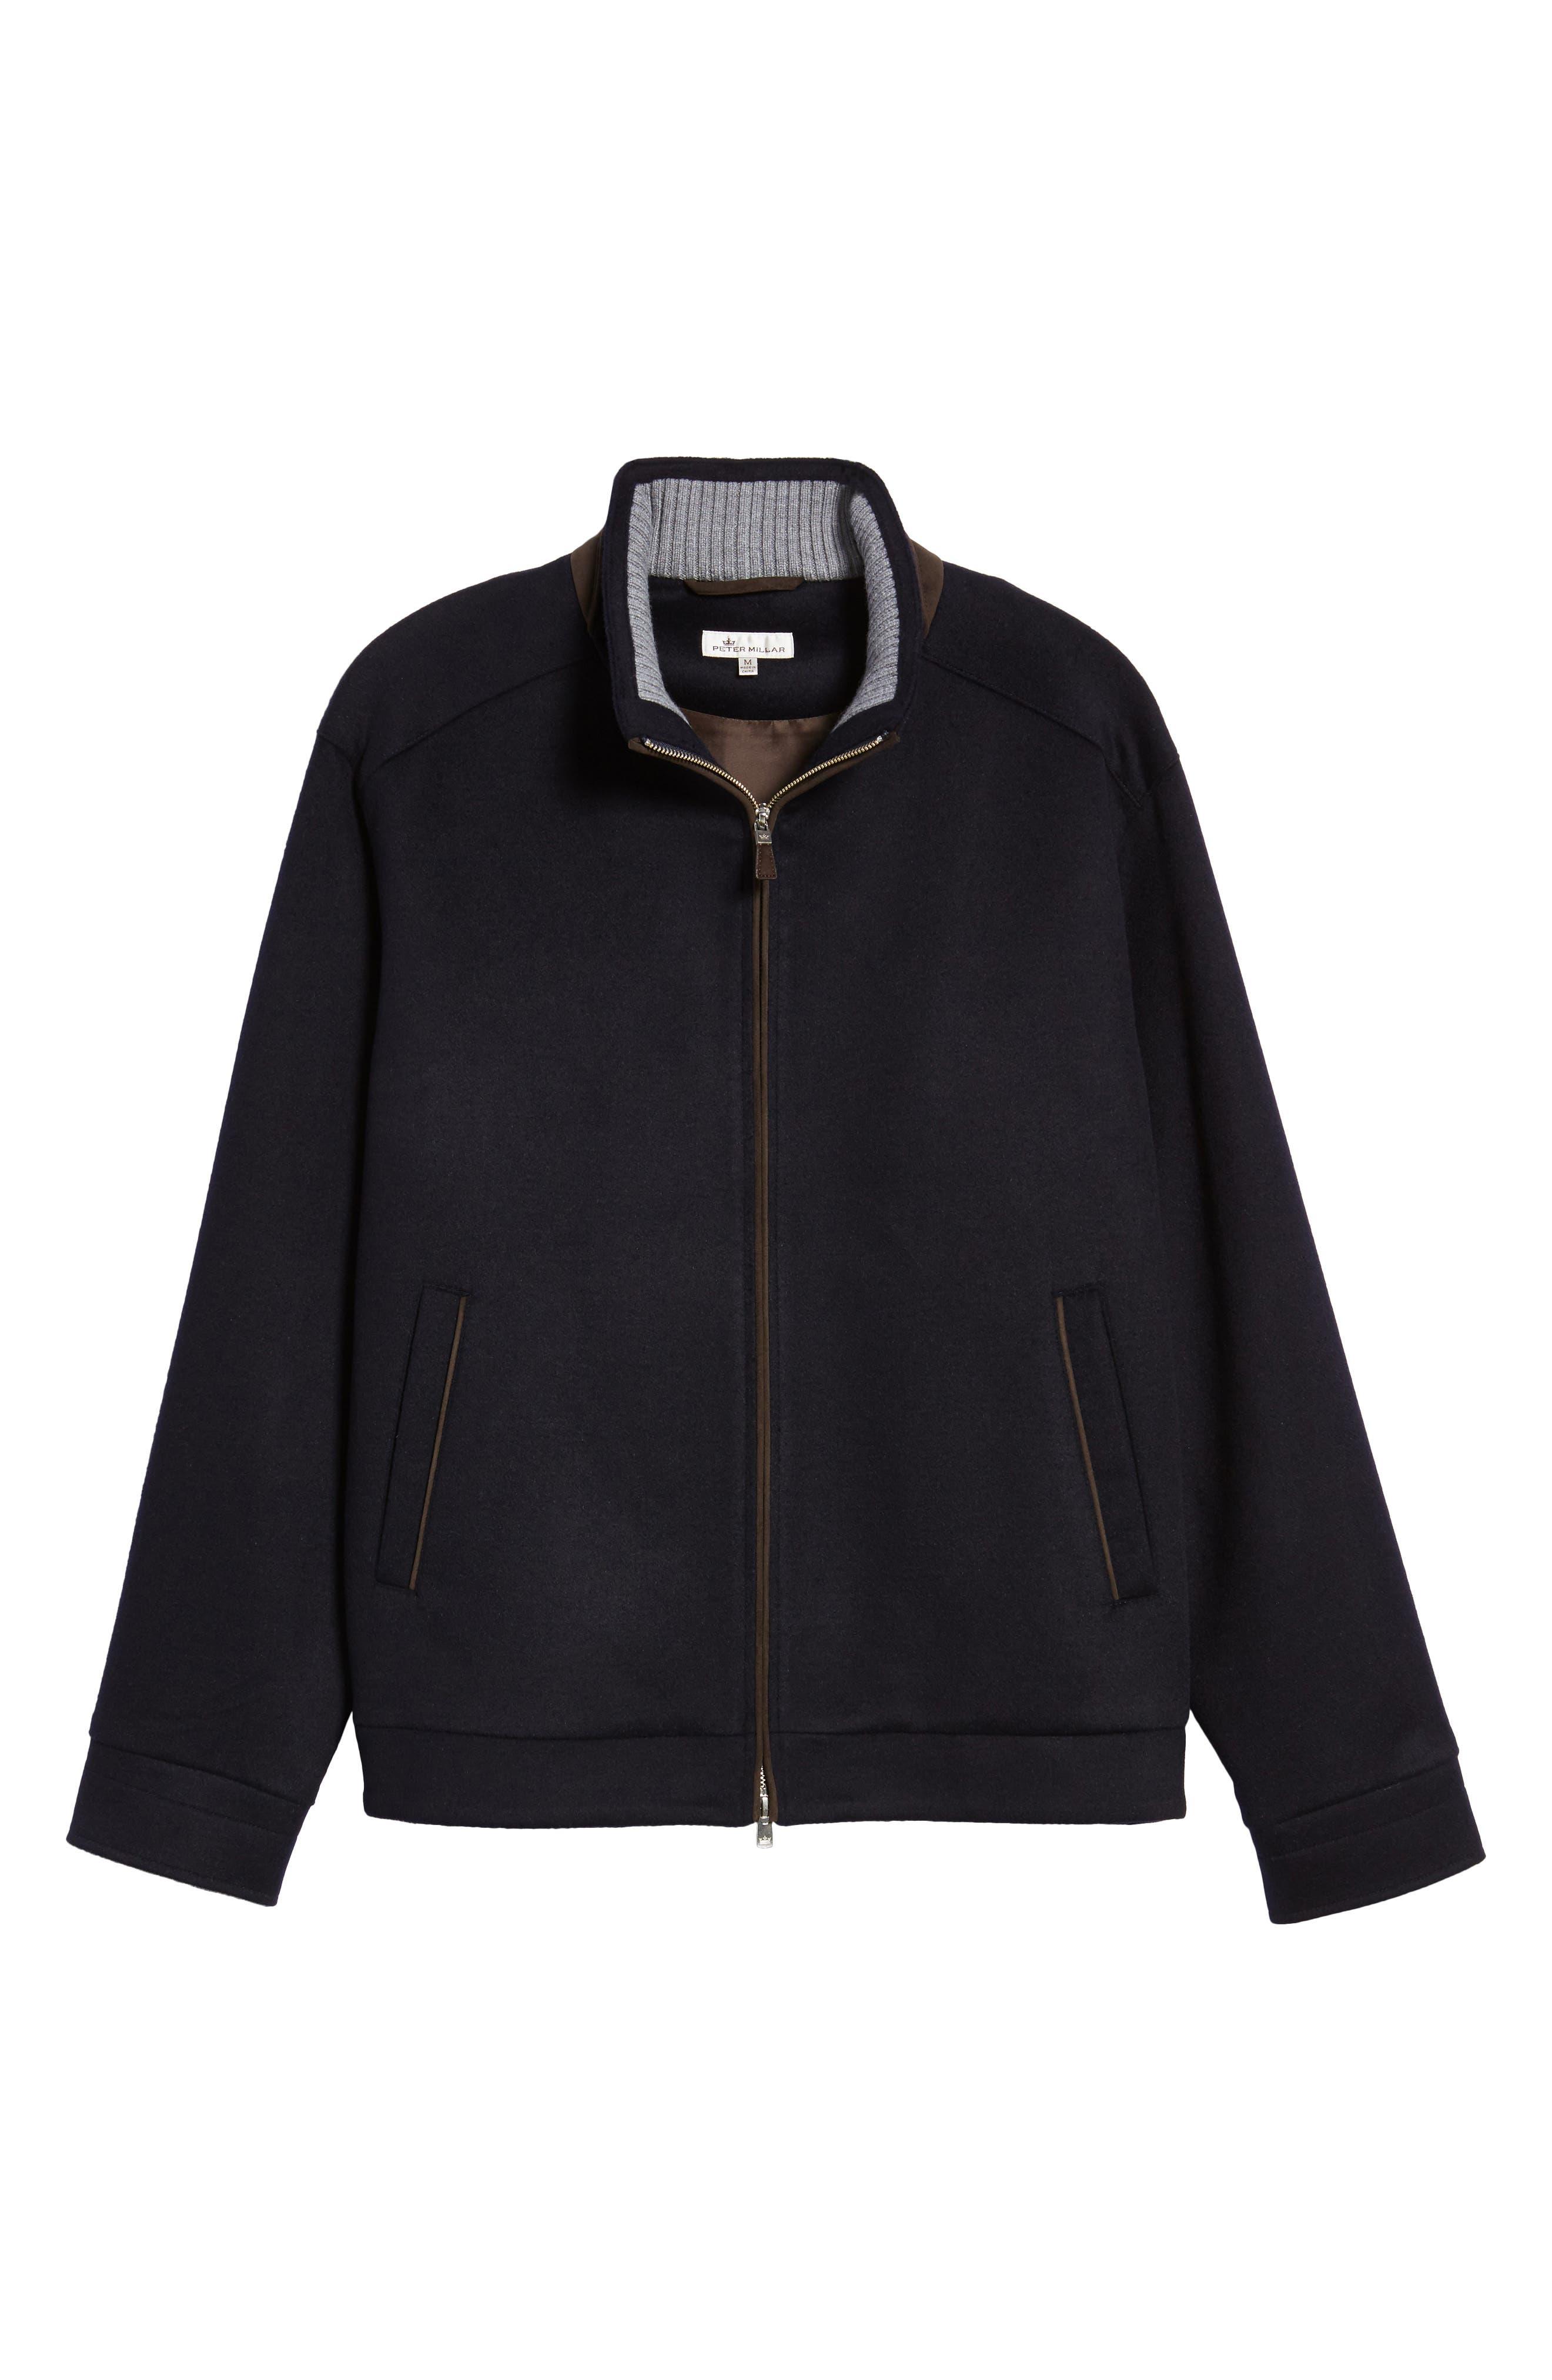 Westport Wool & Cashmere Jacket,                             Alternate thumbnail 15, color,